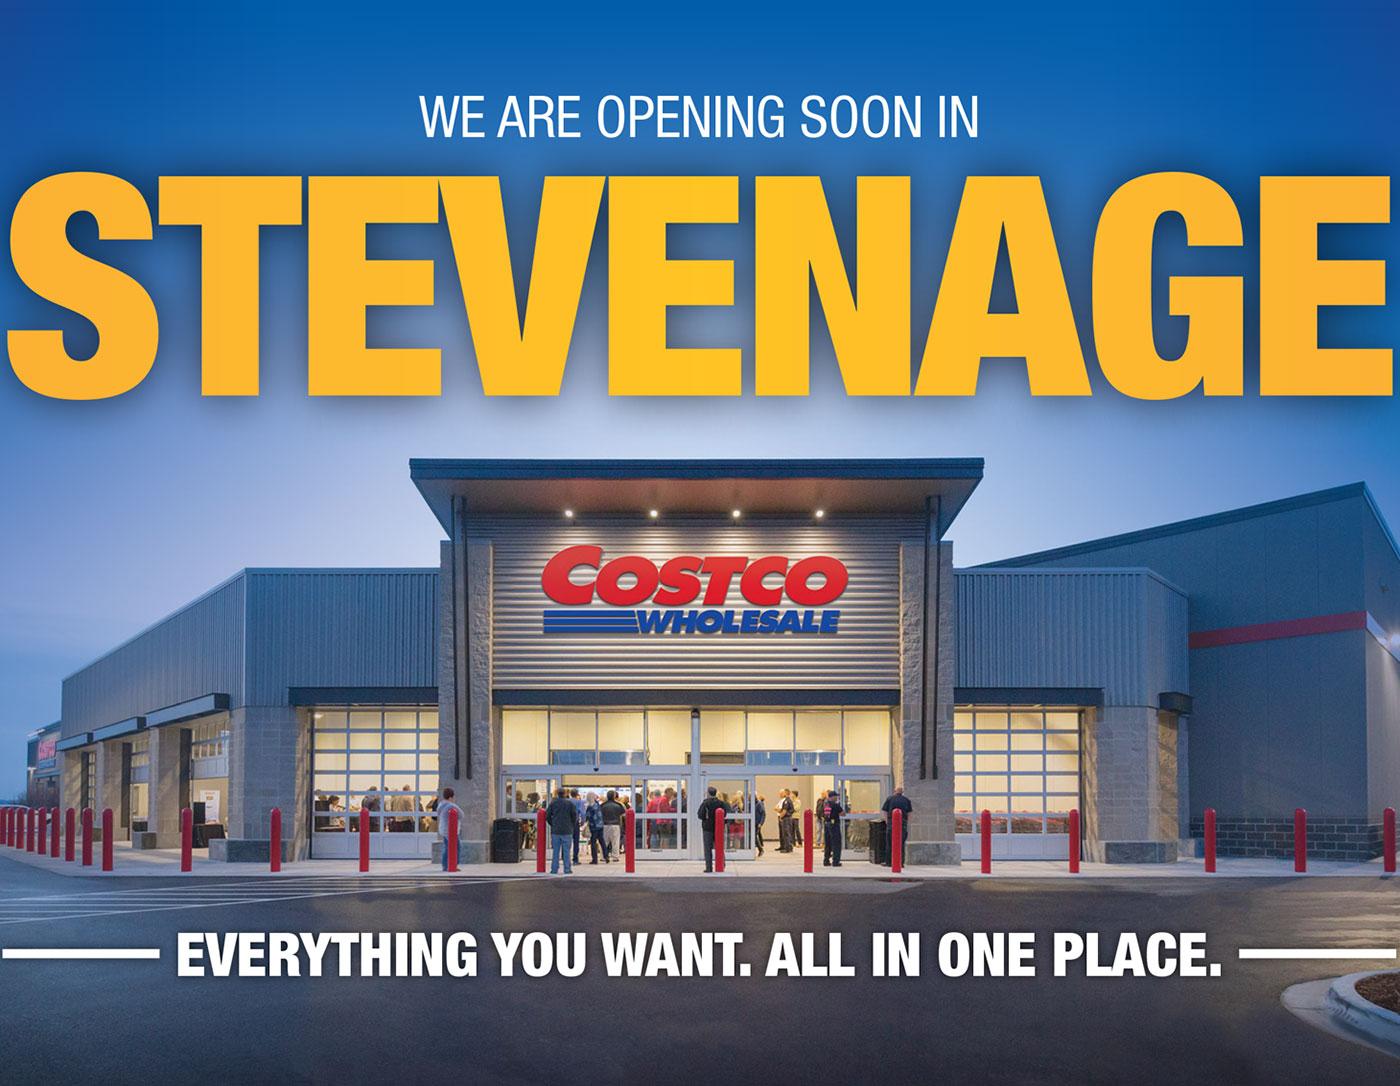 Costco Stevenage New Membership opening offer